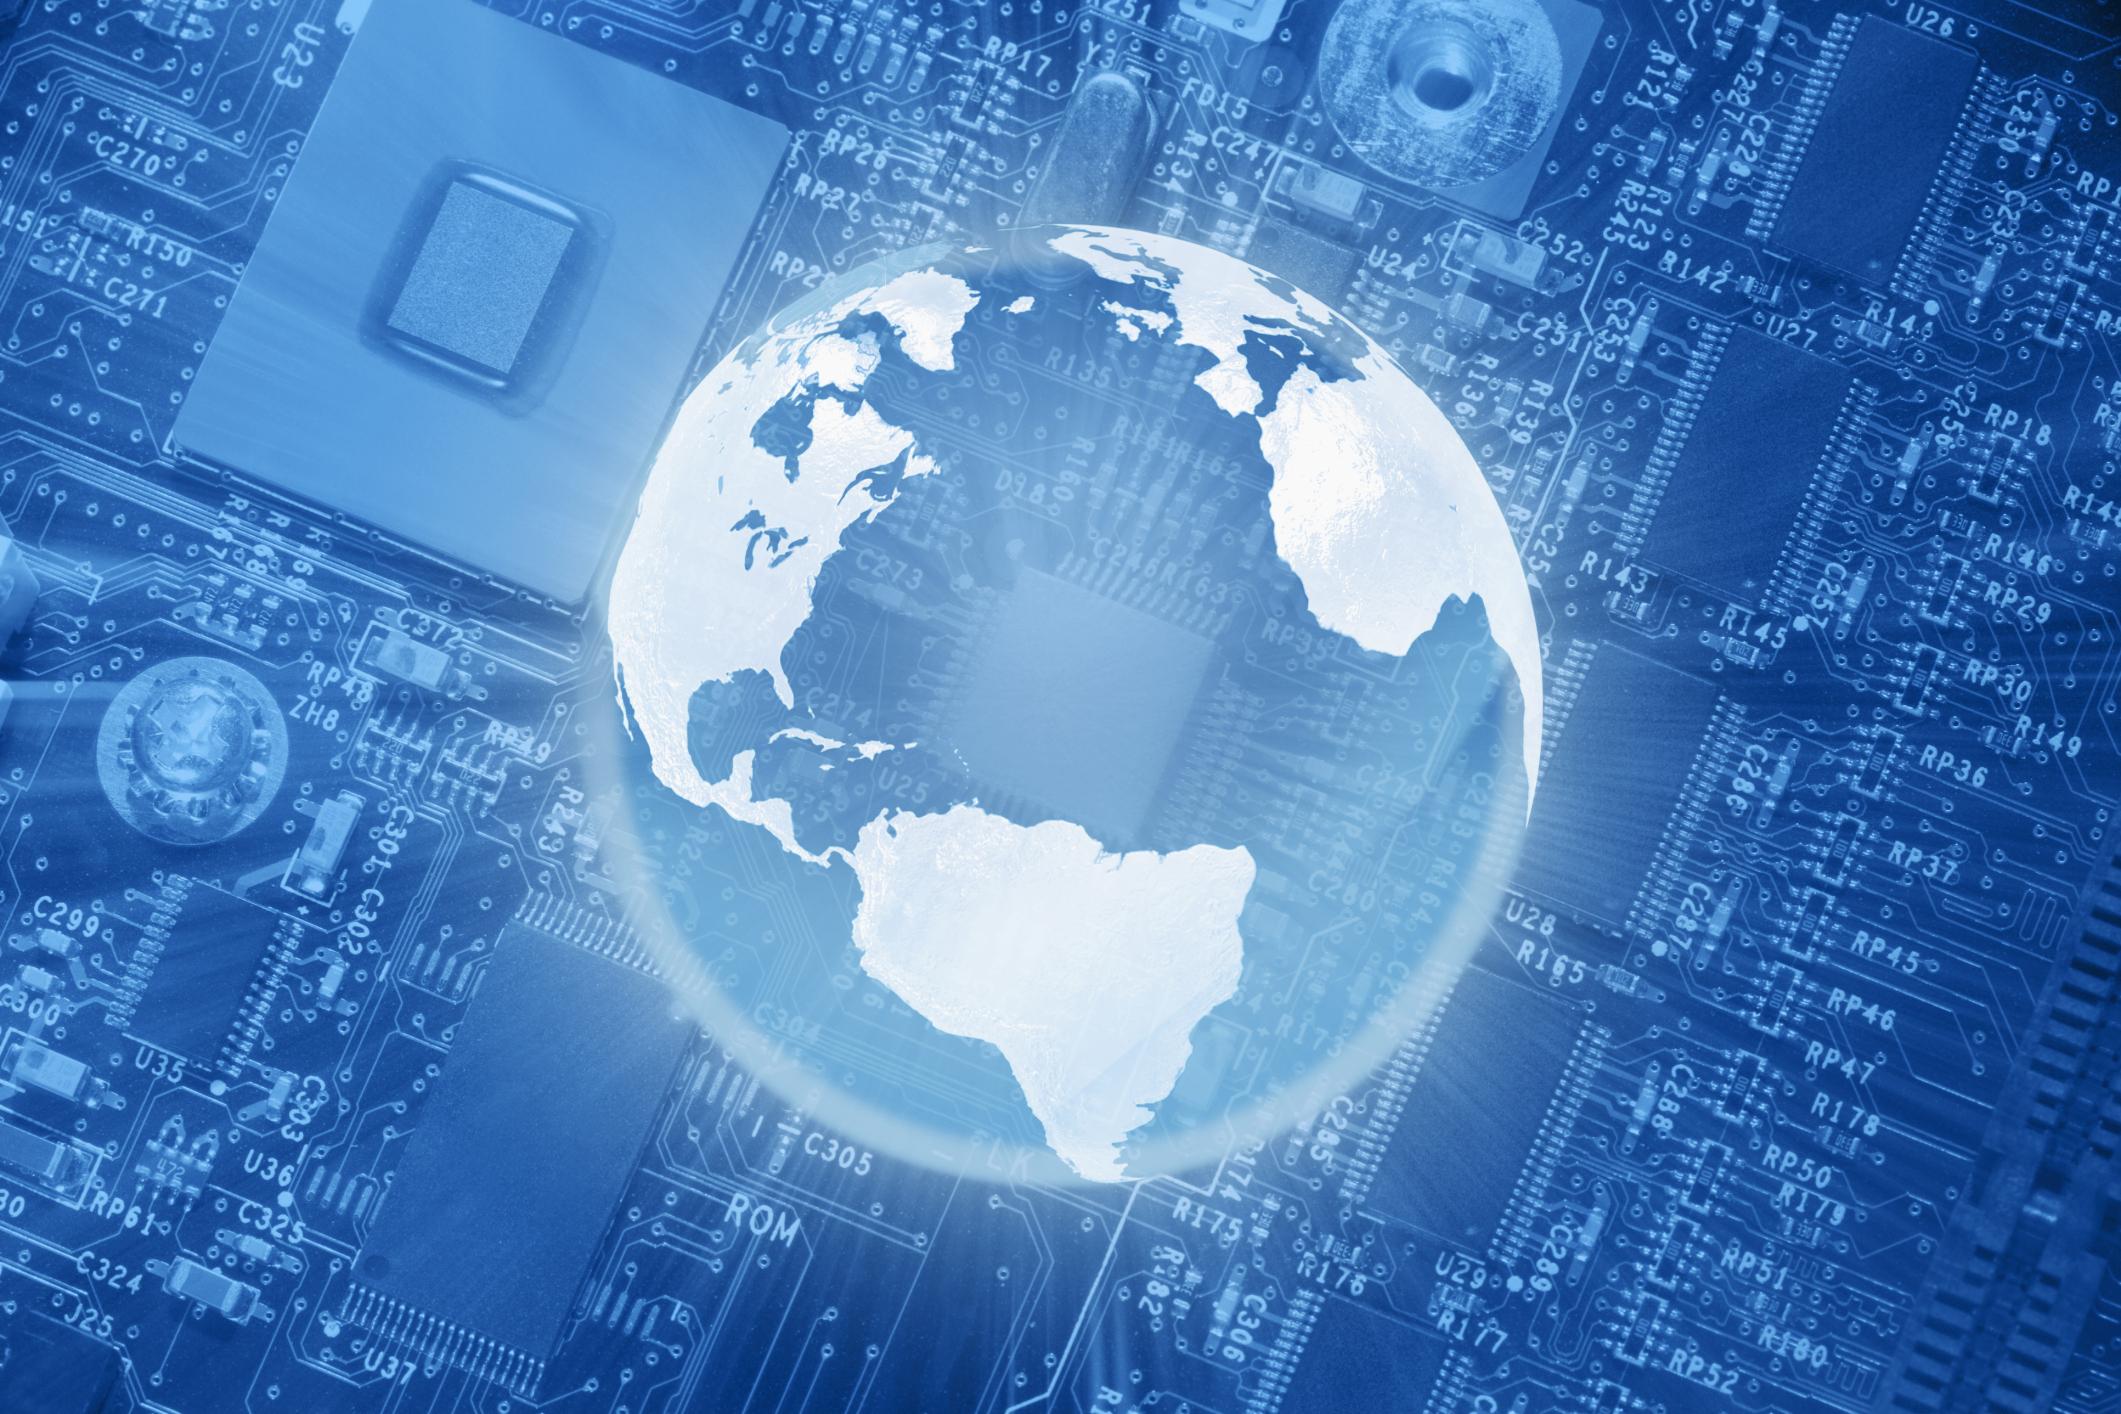 Blue Chip Property Management